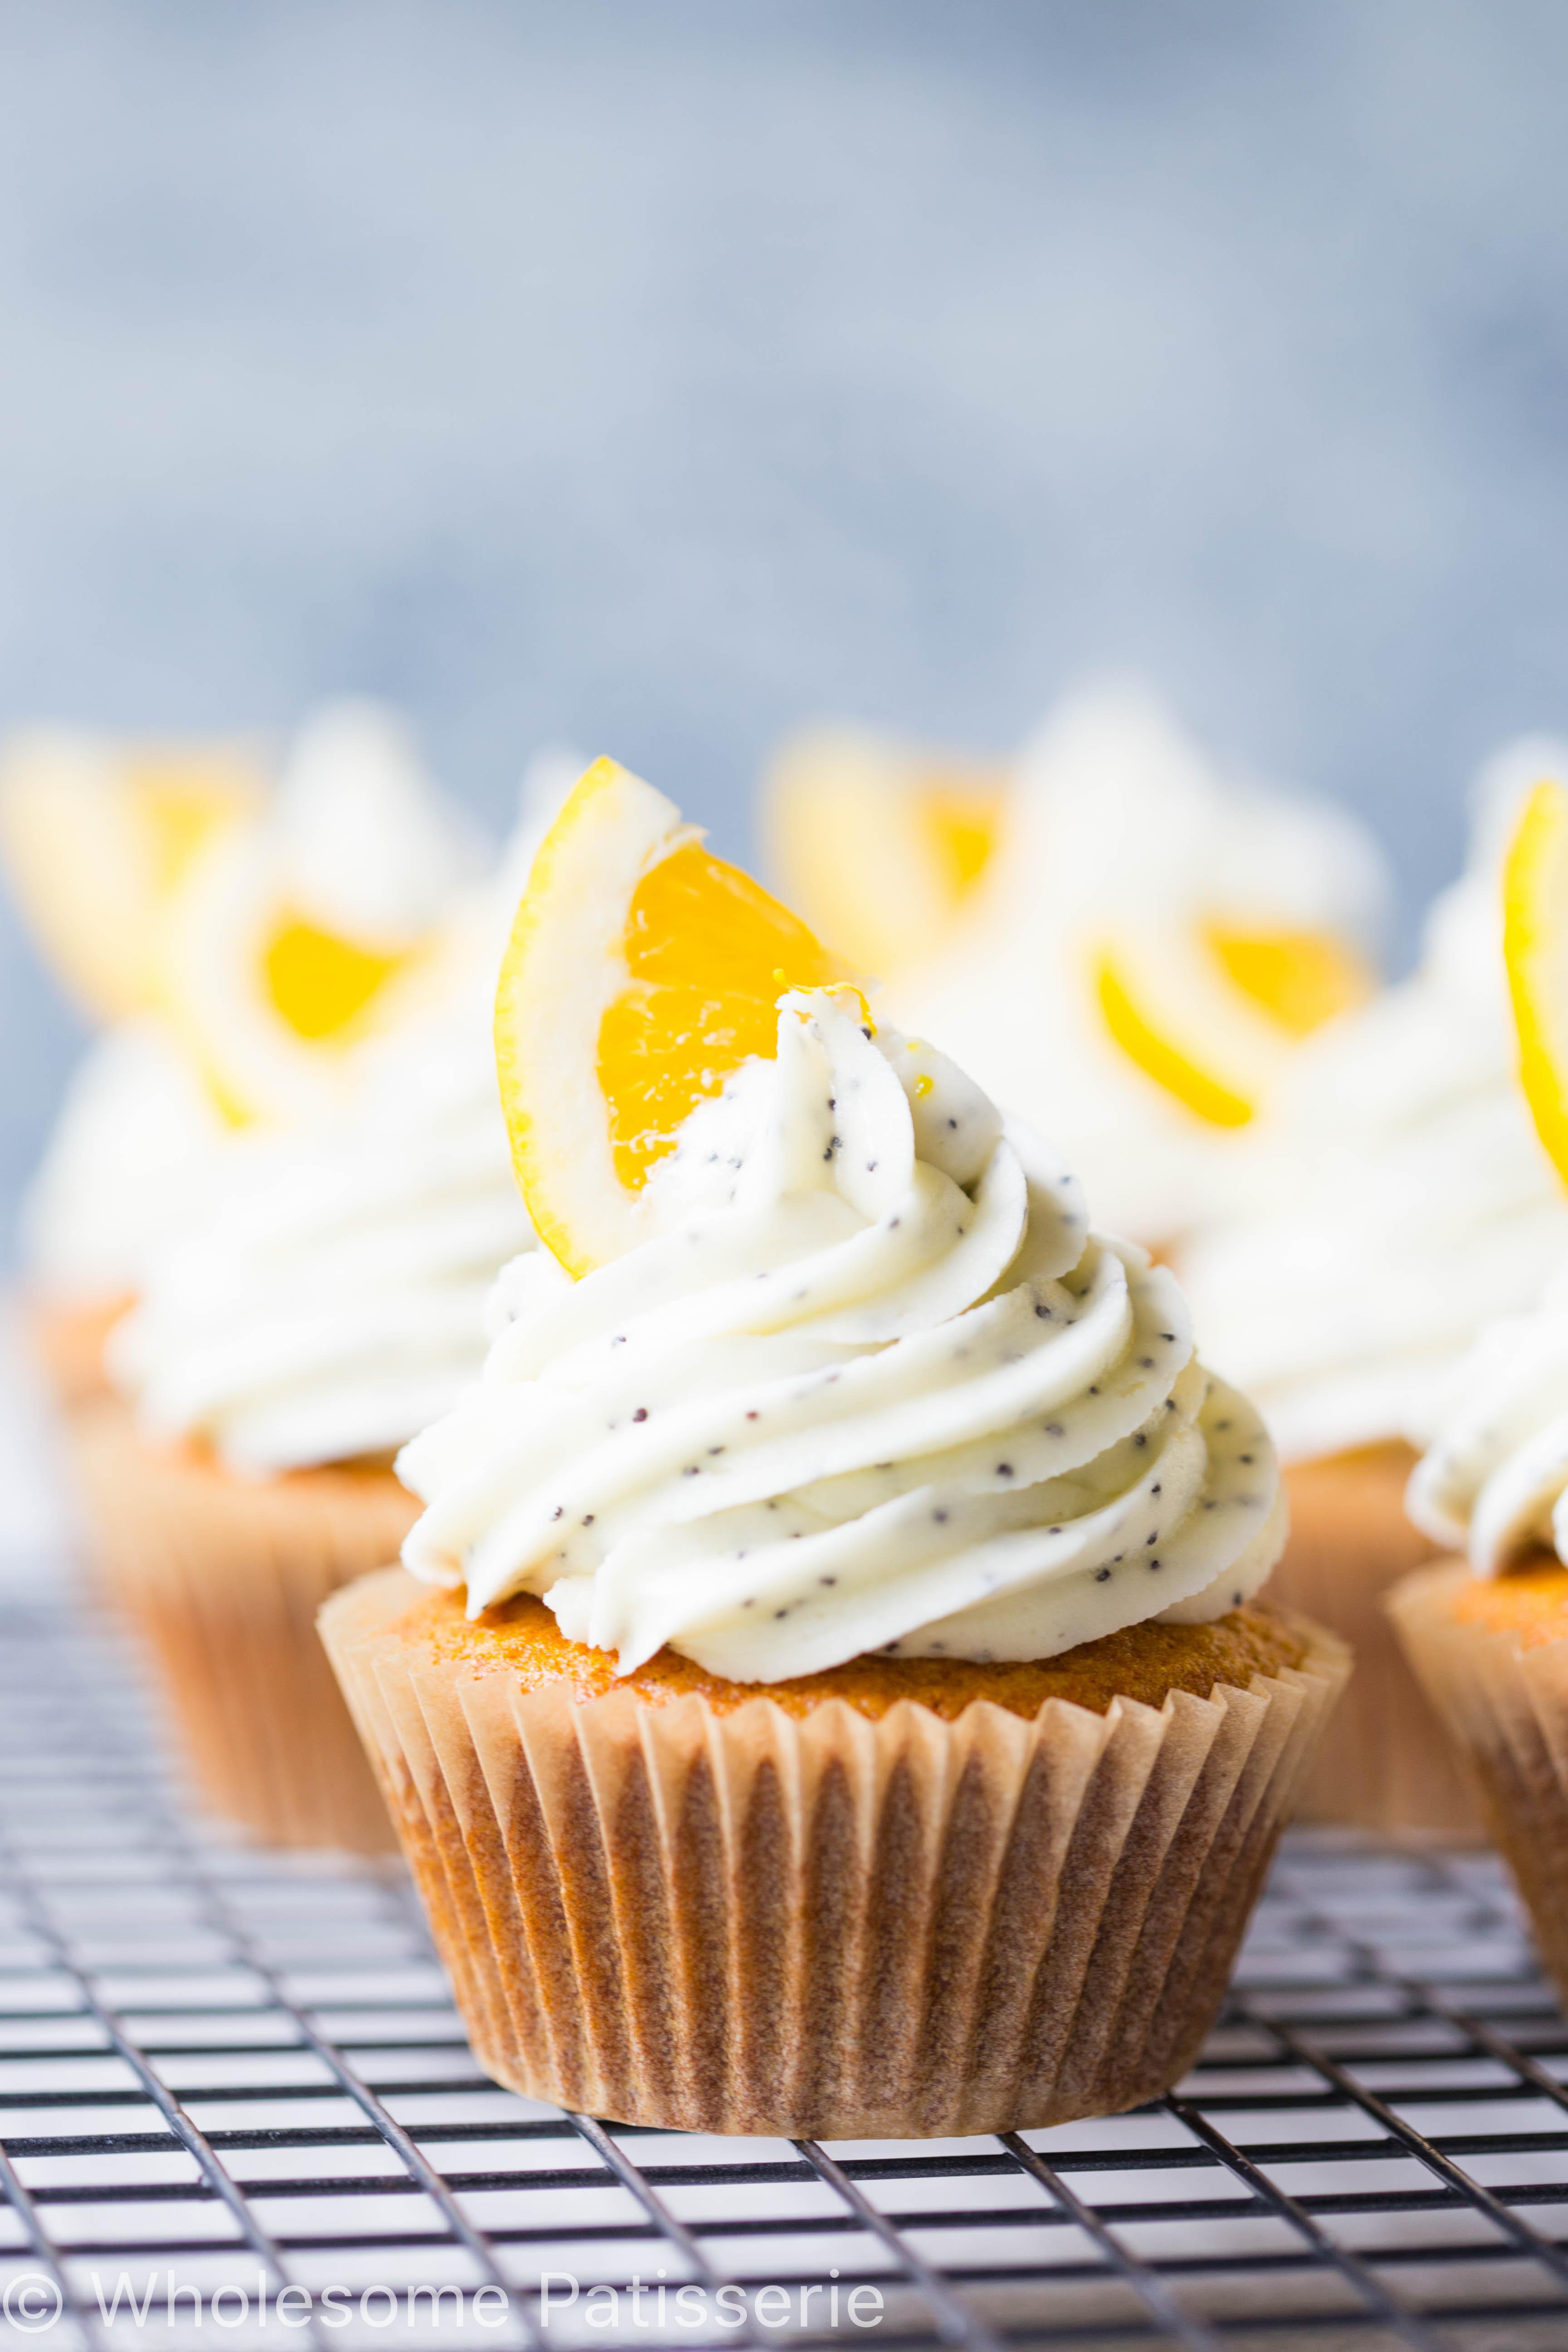 Gluten Free Cupcakes Recipe  Lemon Poppyseed Cupcakes